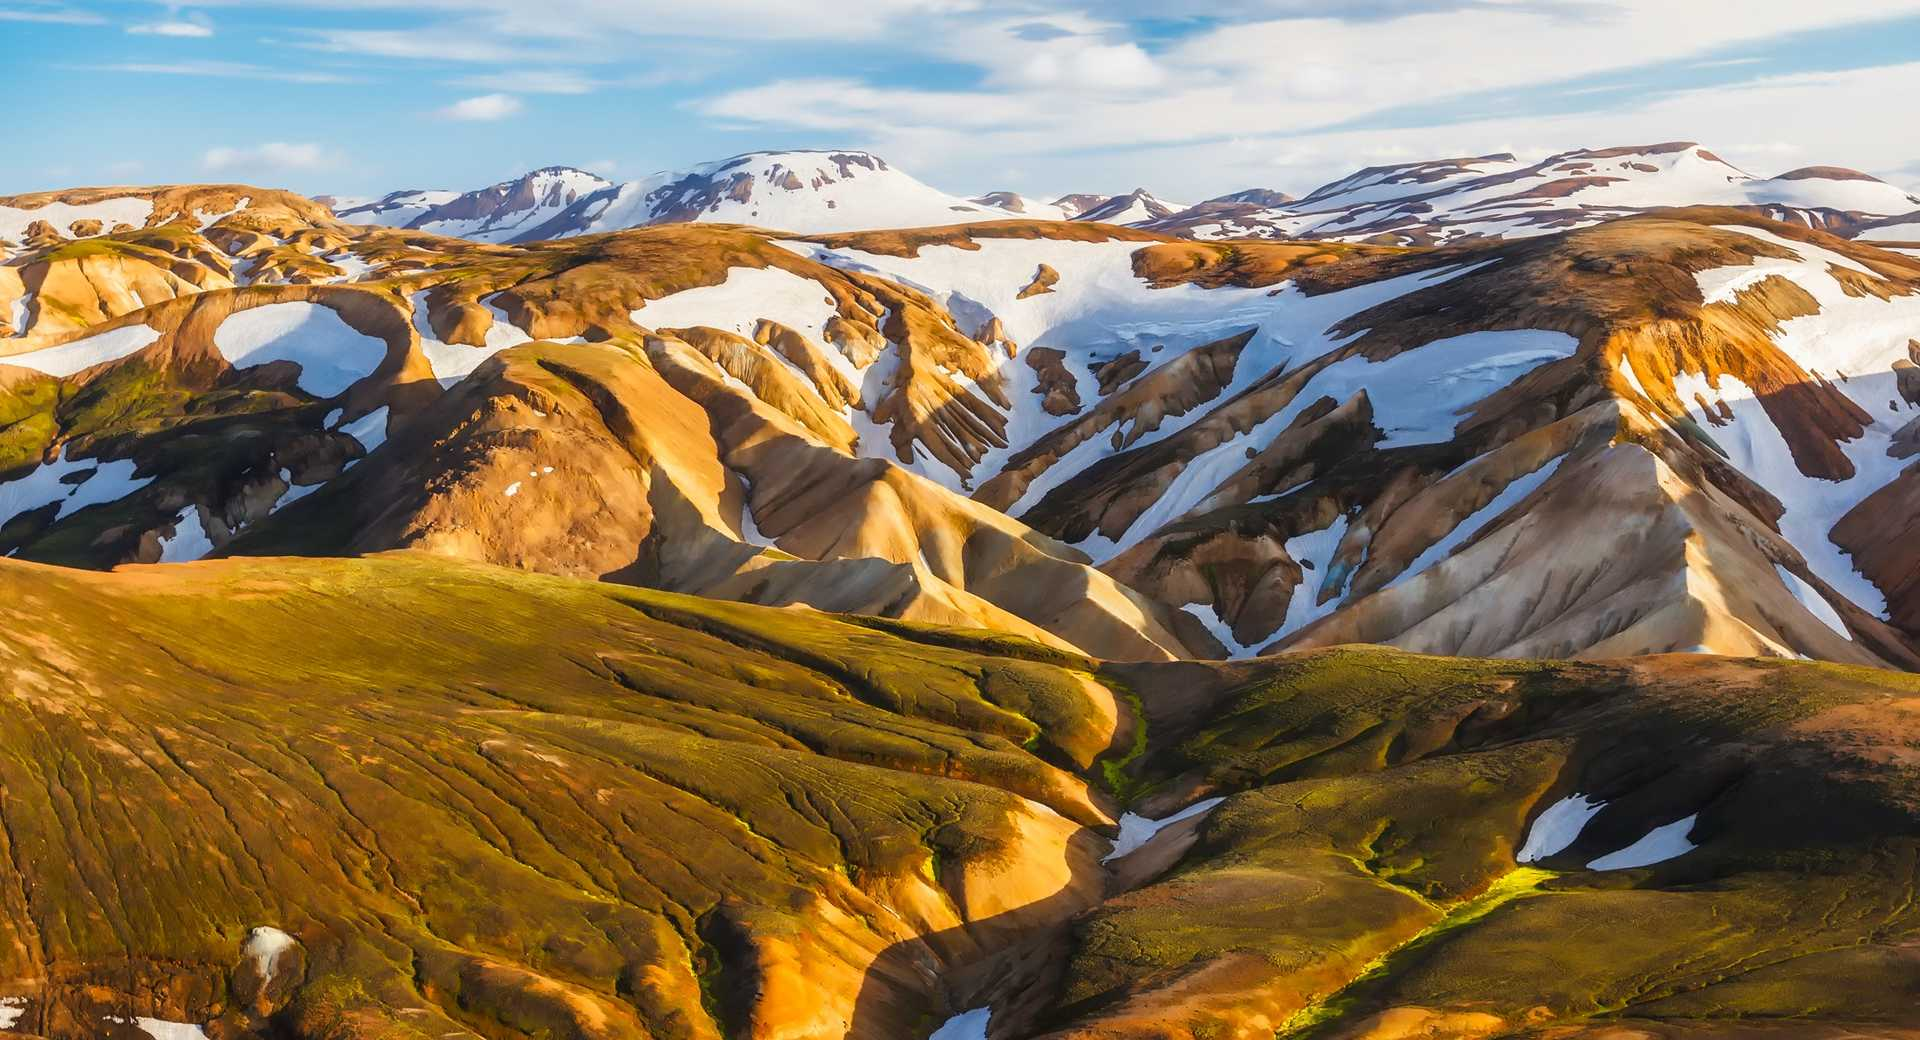 Paysage de montagnes en Islande, massif de Kerlingarfjöll